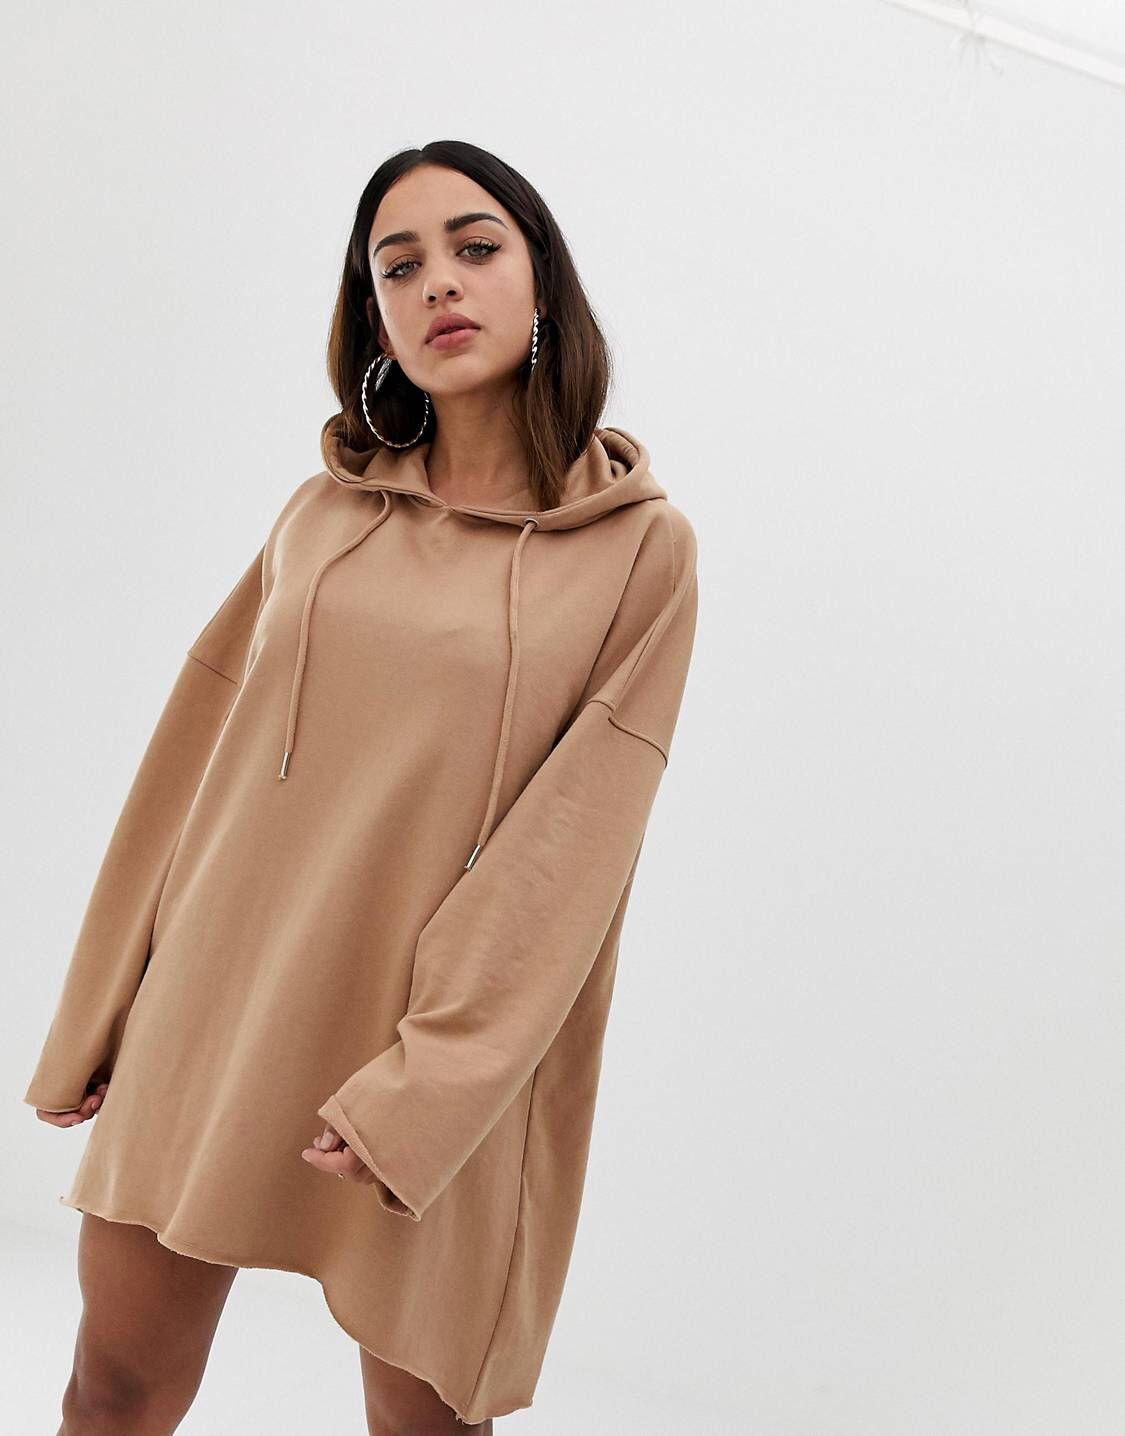 5eb84ca817d Бежевое платье-свитер мини с капюшоном Missguided в 2019 г.